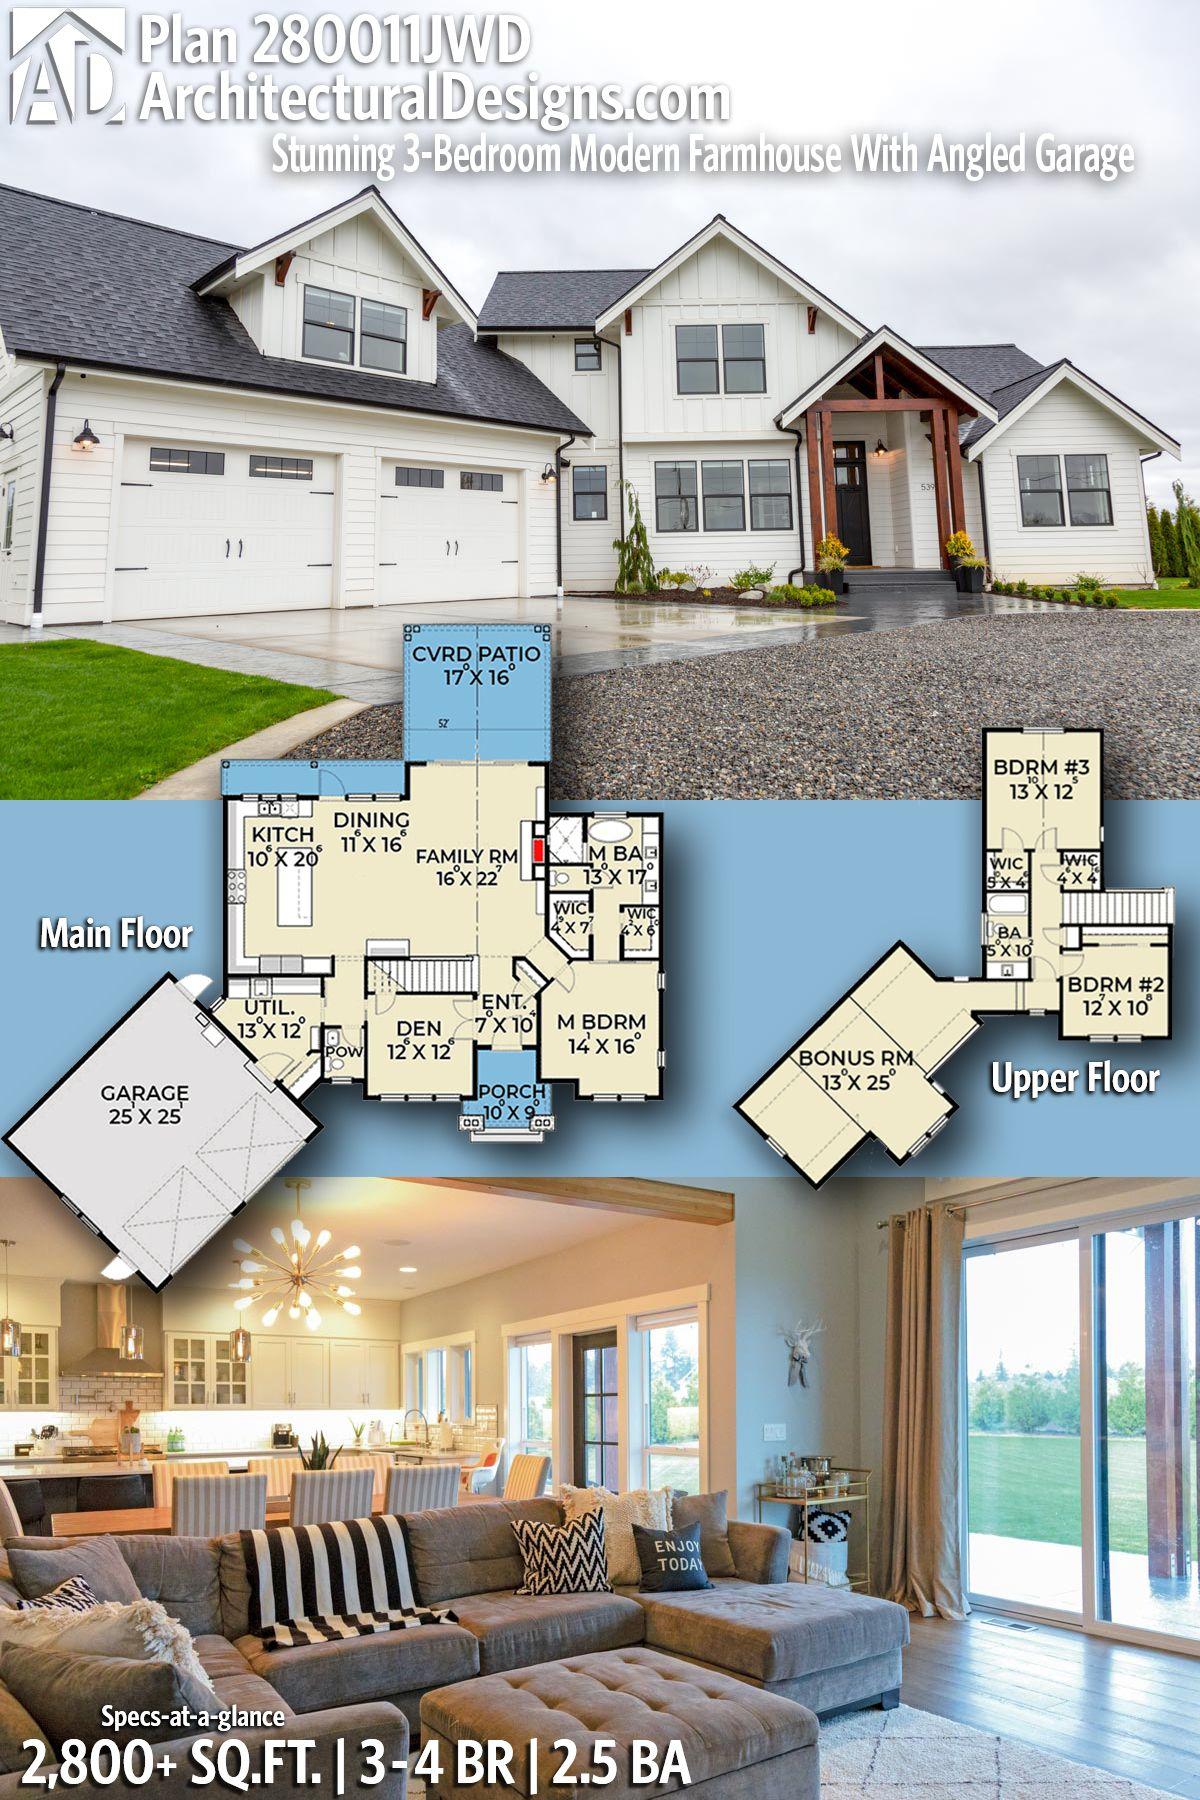 Plan 280011jwd Stunning 3 Bedroom Modern Farmhouse With Angled Garage Farmhouse Style House Interior Farmhouse Style House Modern Farmhouse Plans